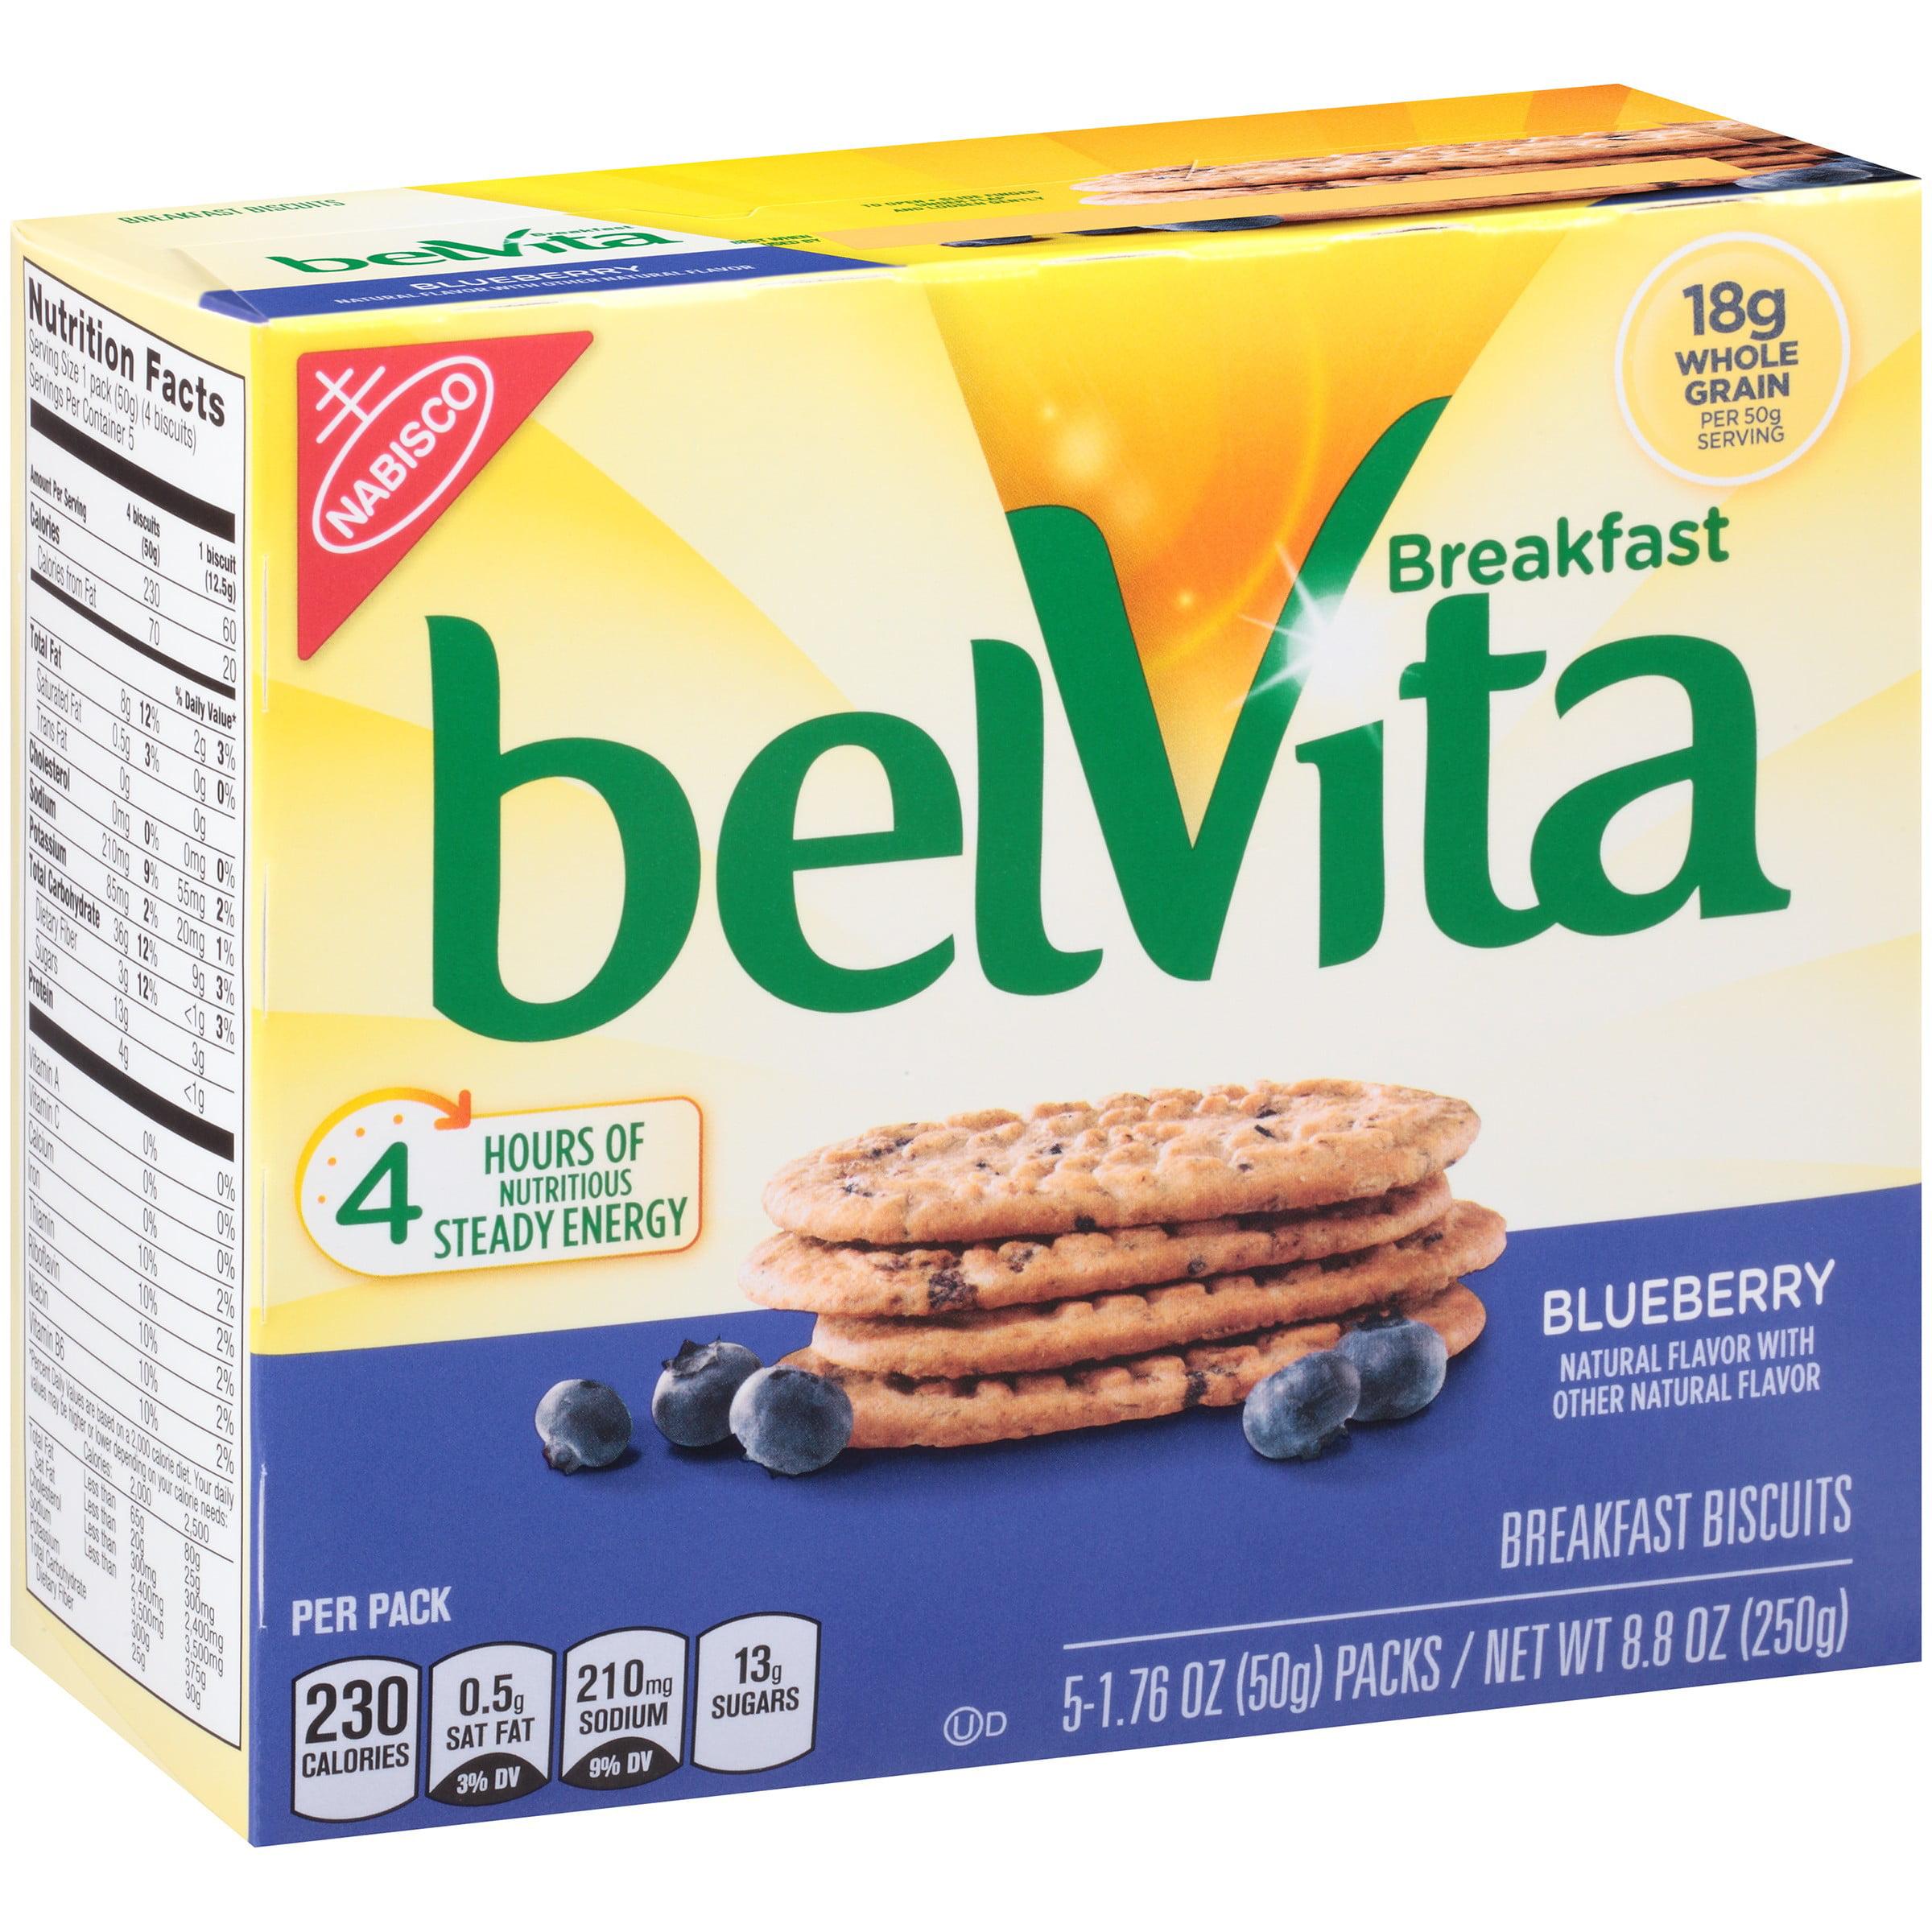 belVita Breakfast Biscuits Blueberry, 176 oz, 5 Count by Mondelez Global LLC